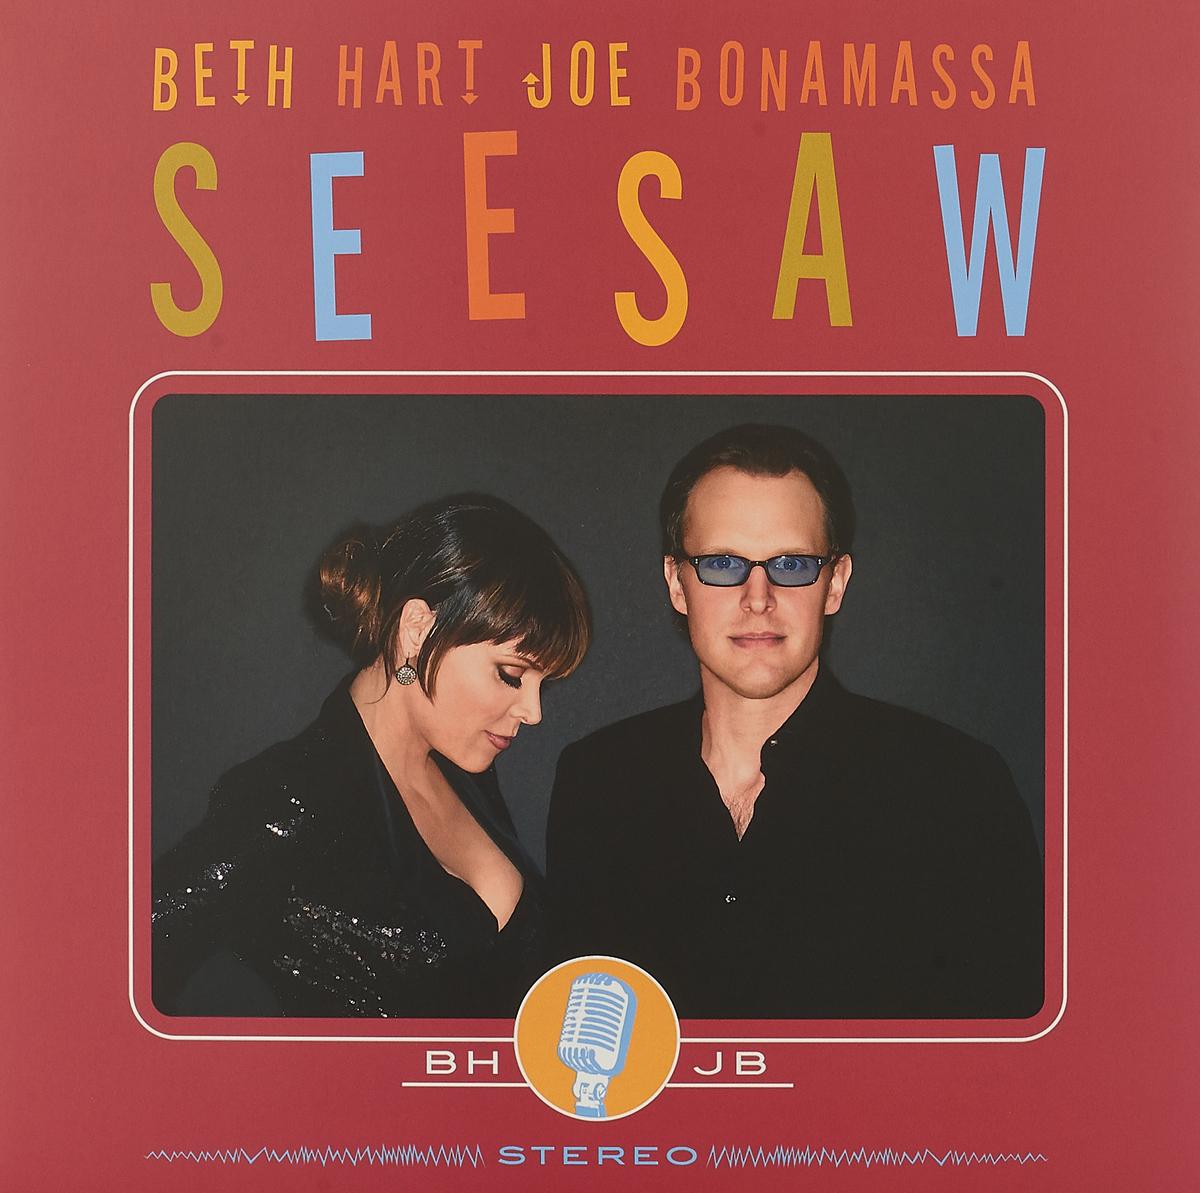 Бет Хат,Джо Бонамасса Beth Hart & Joe Bonamassa. Seesaw (LP)